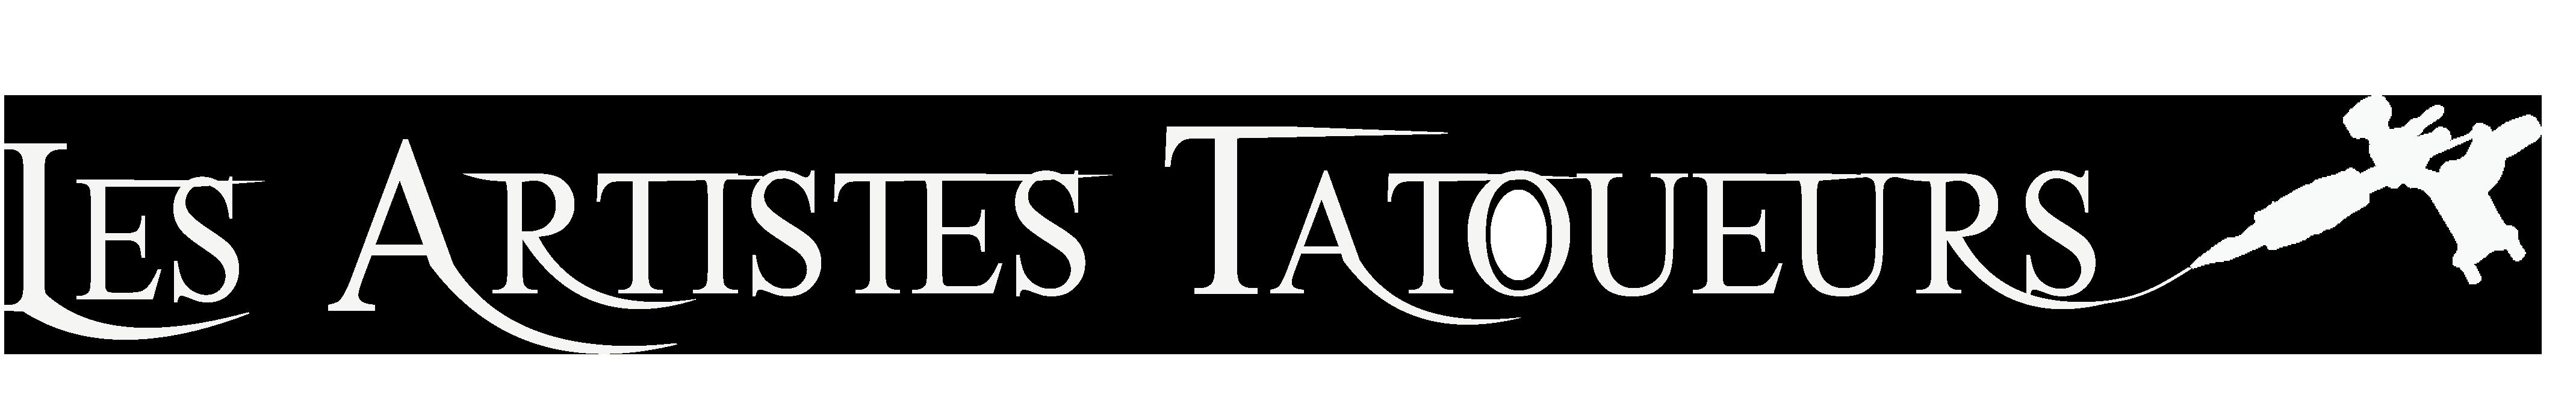 Logo Les Artistes Tatoueurs